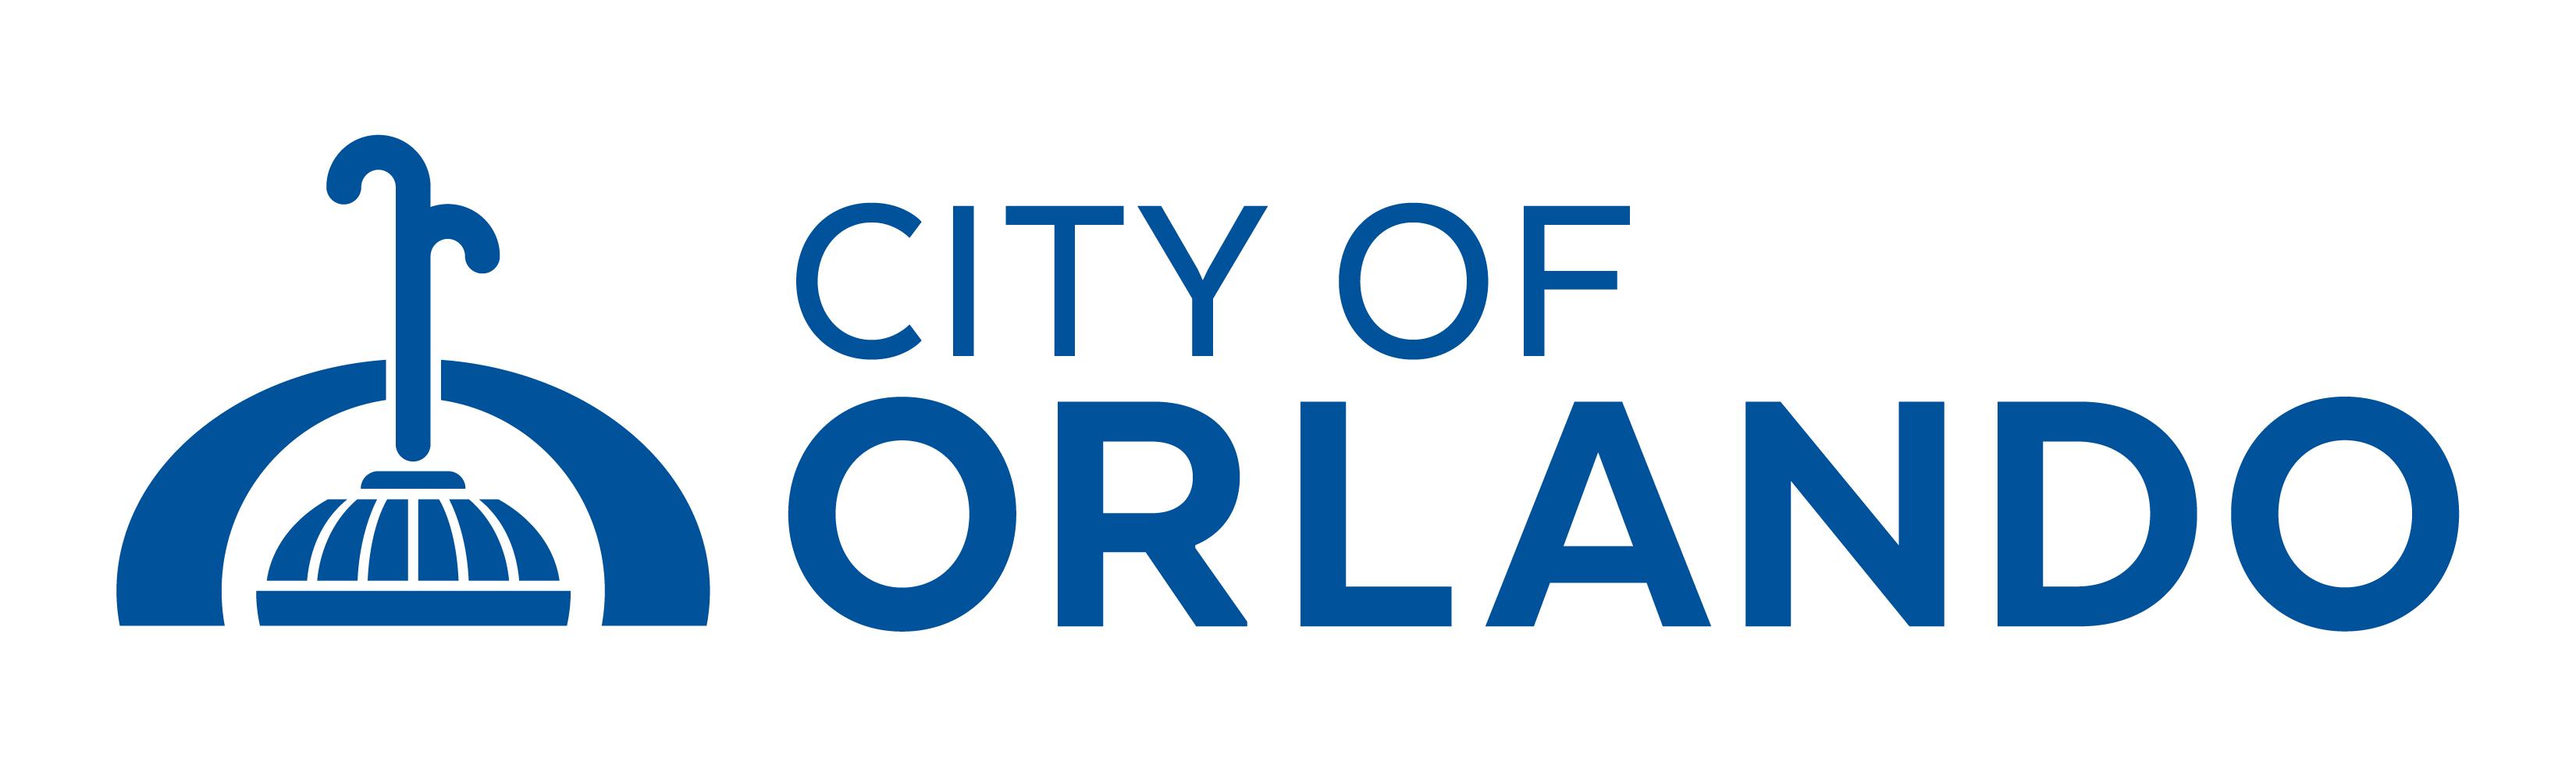 Orlando's logo